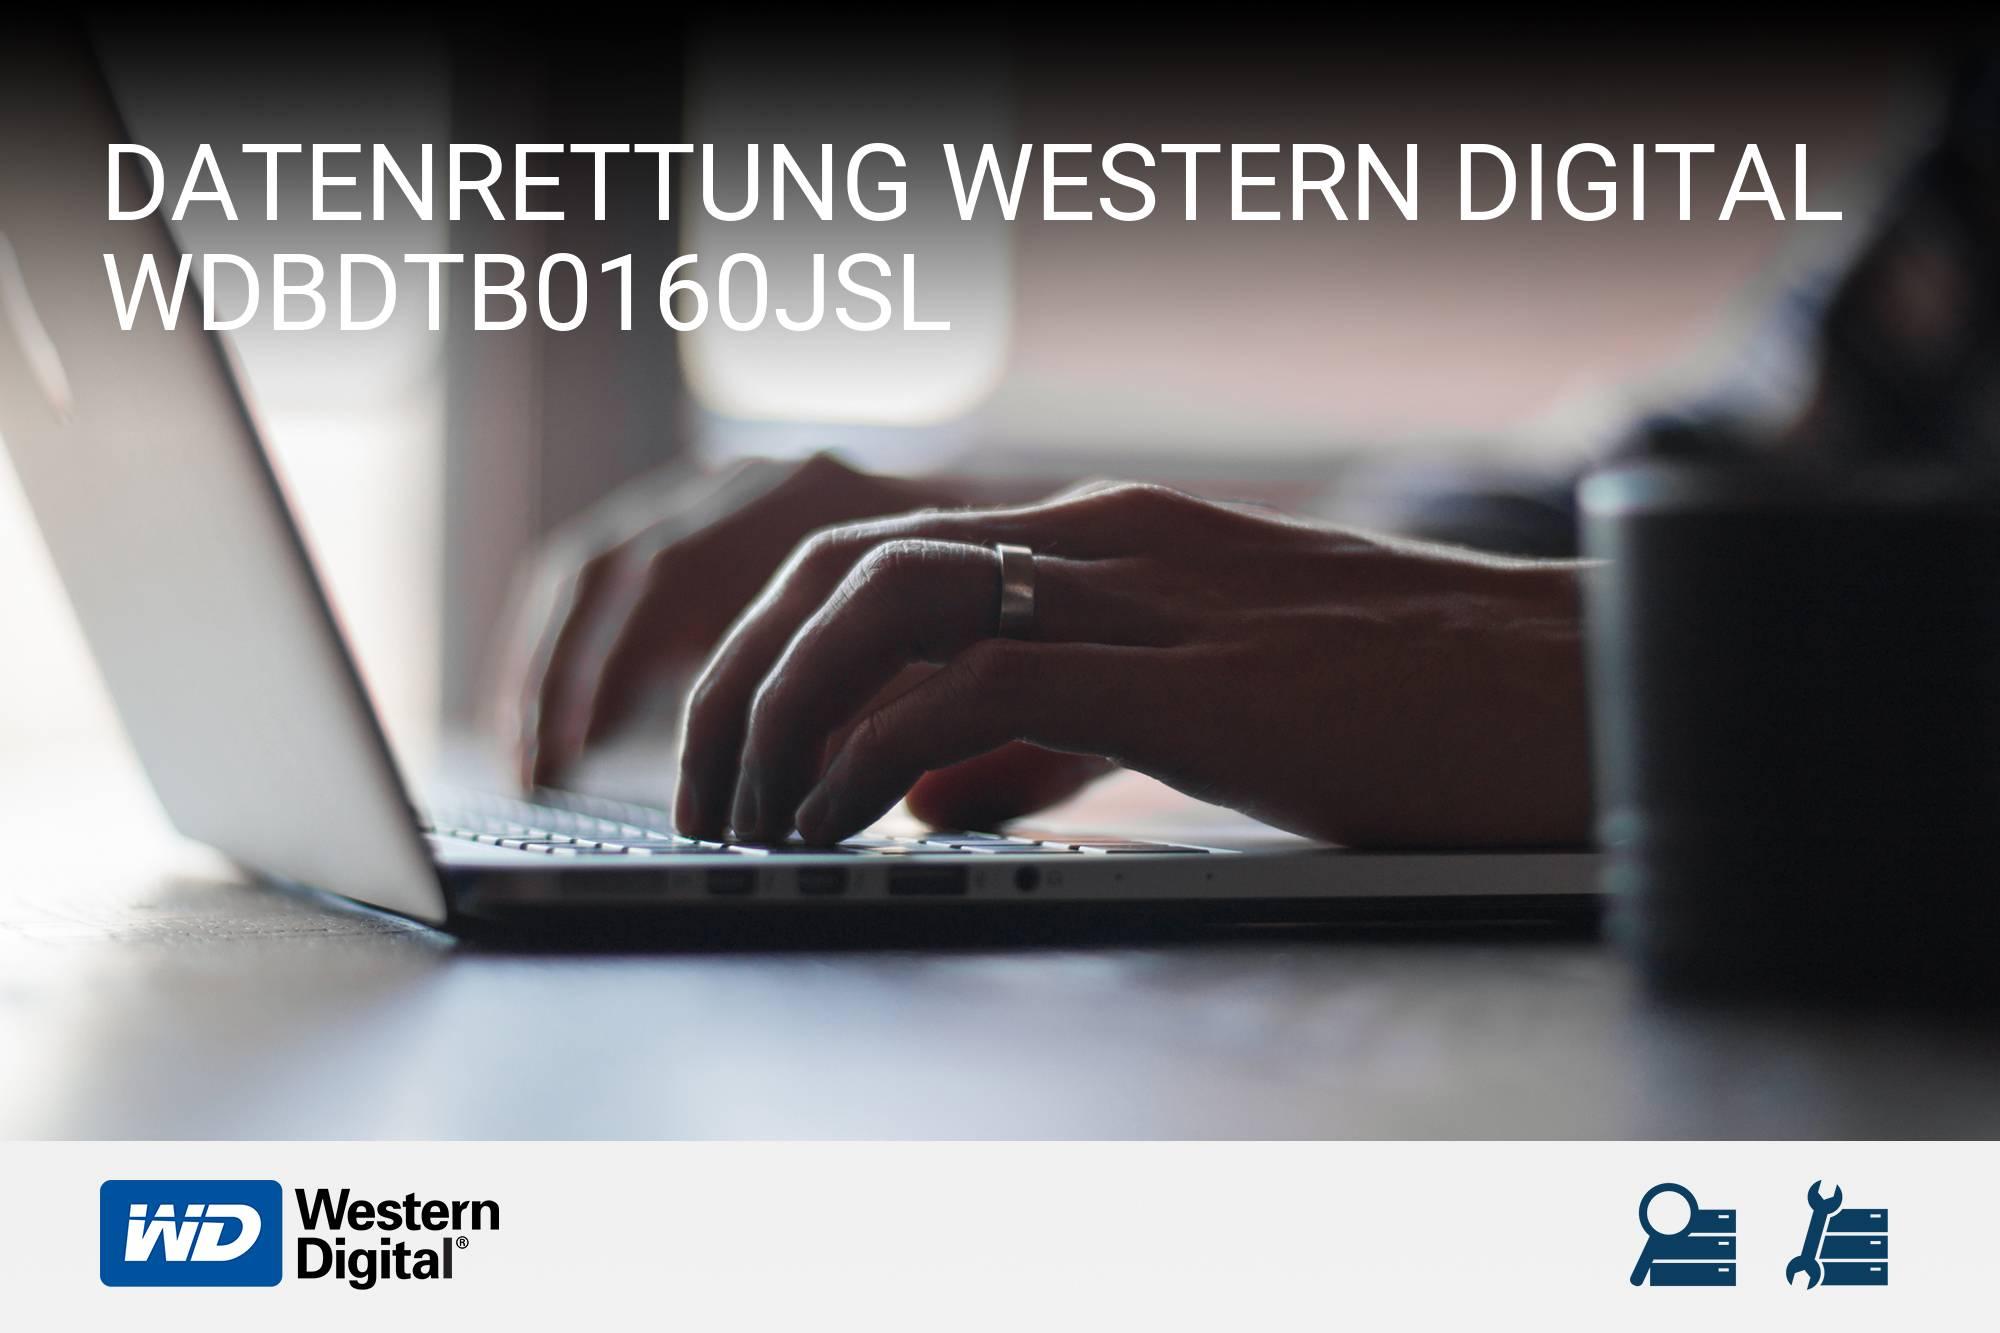 Western Digital WDBDTB0160JSL